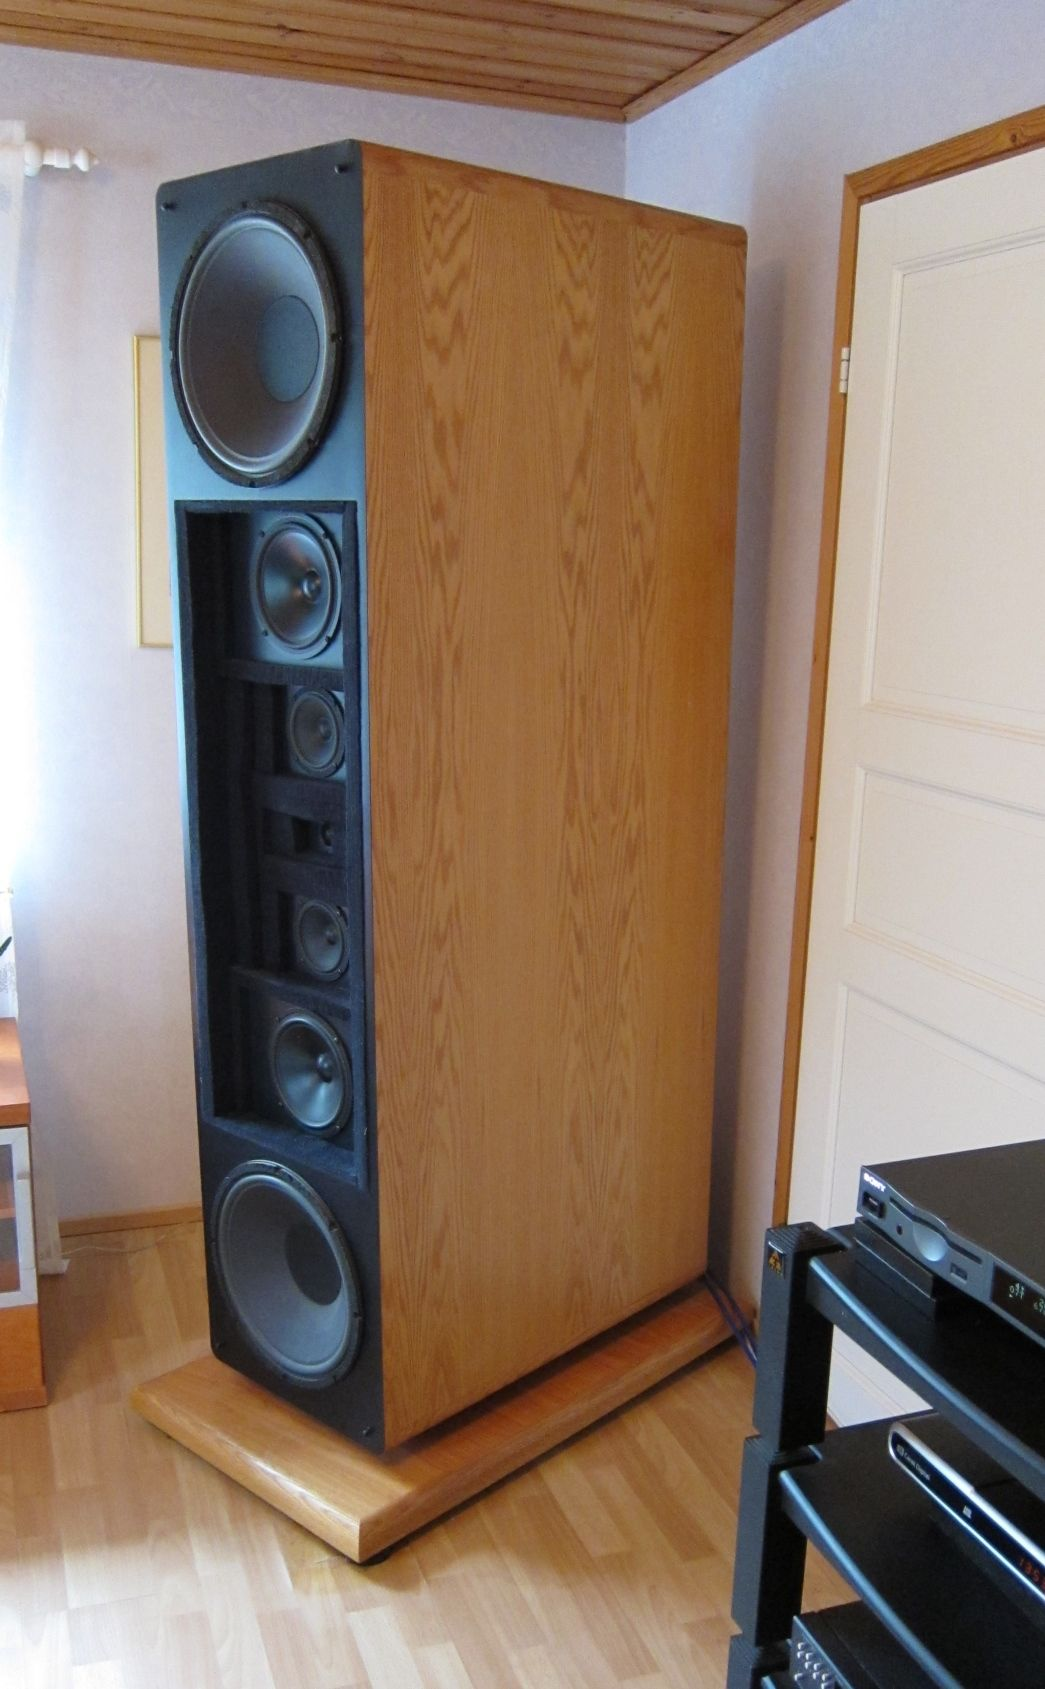 Dunlavy VI 9 | home audio in 2019 | Hifi speakers, Speaker